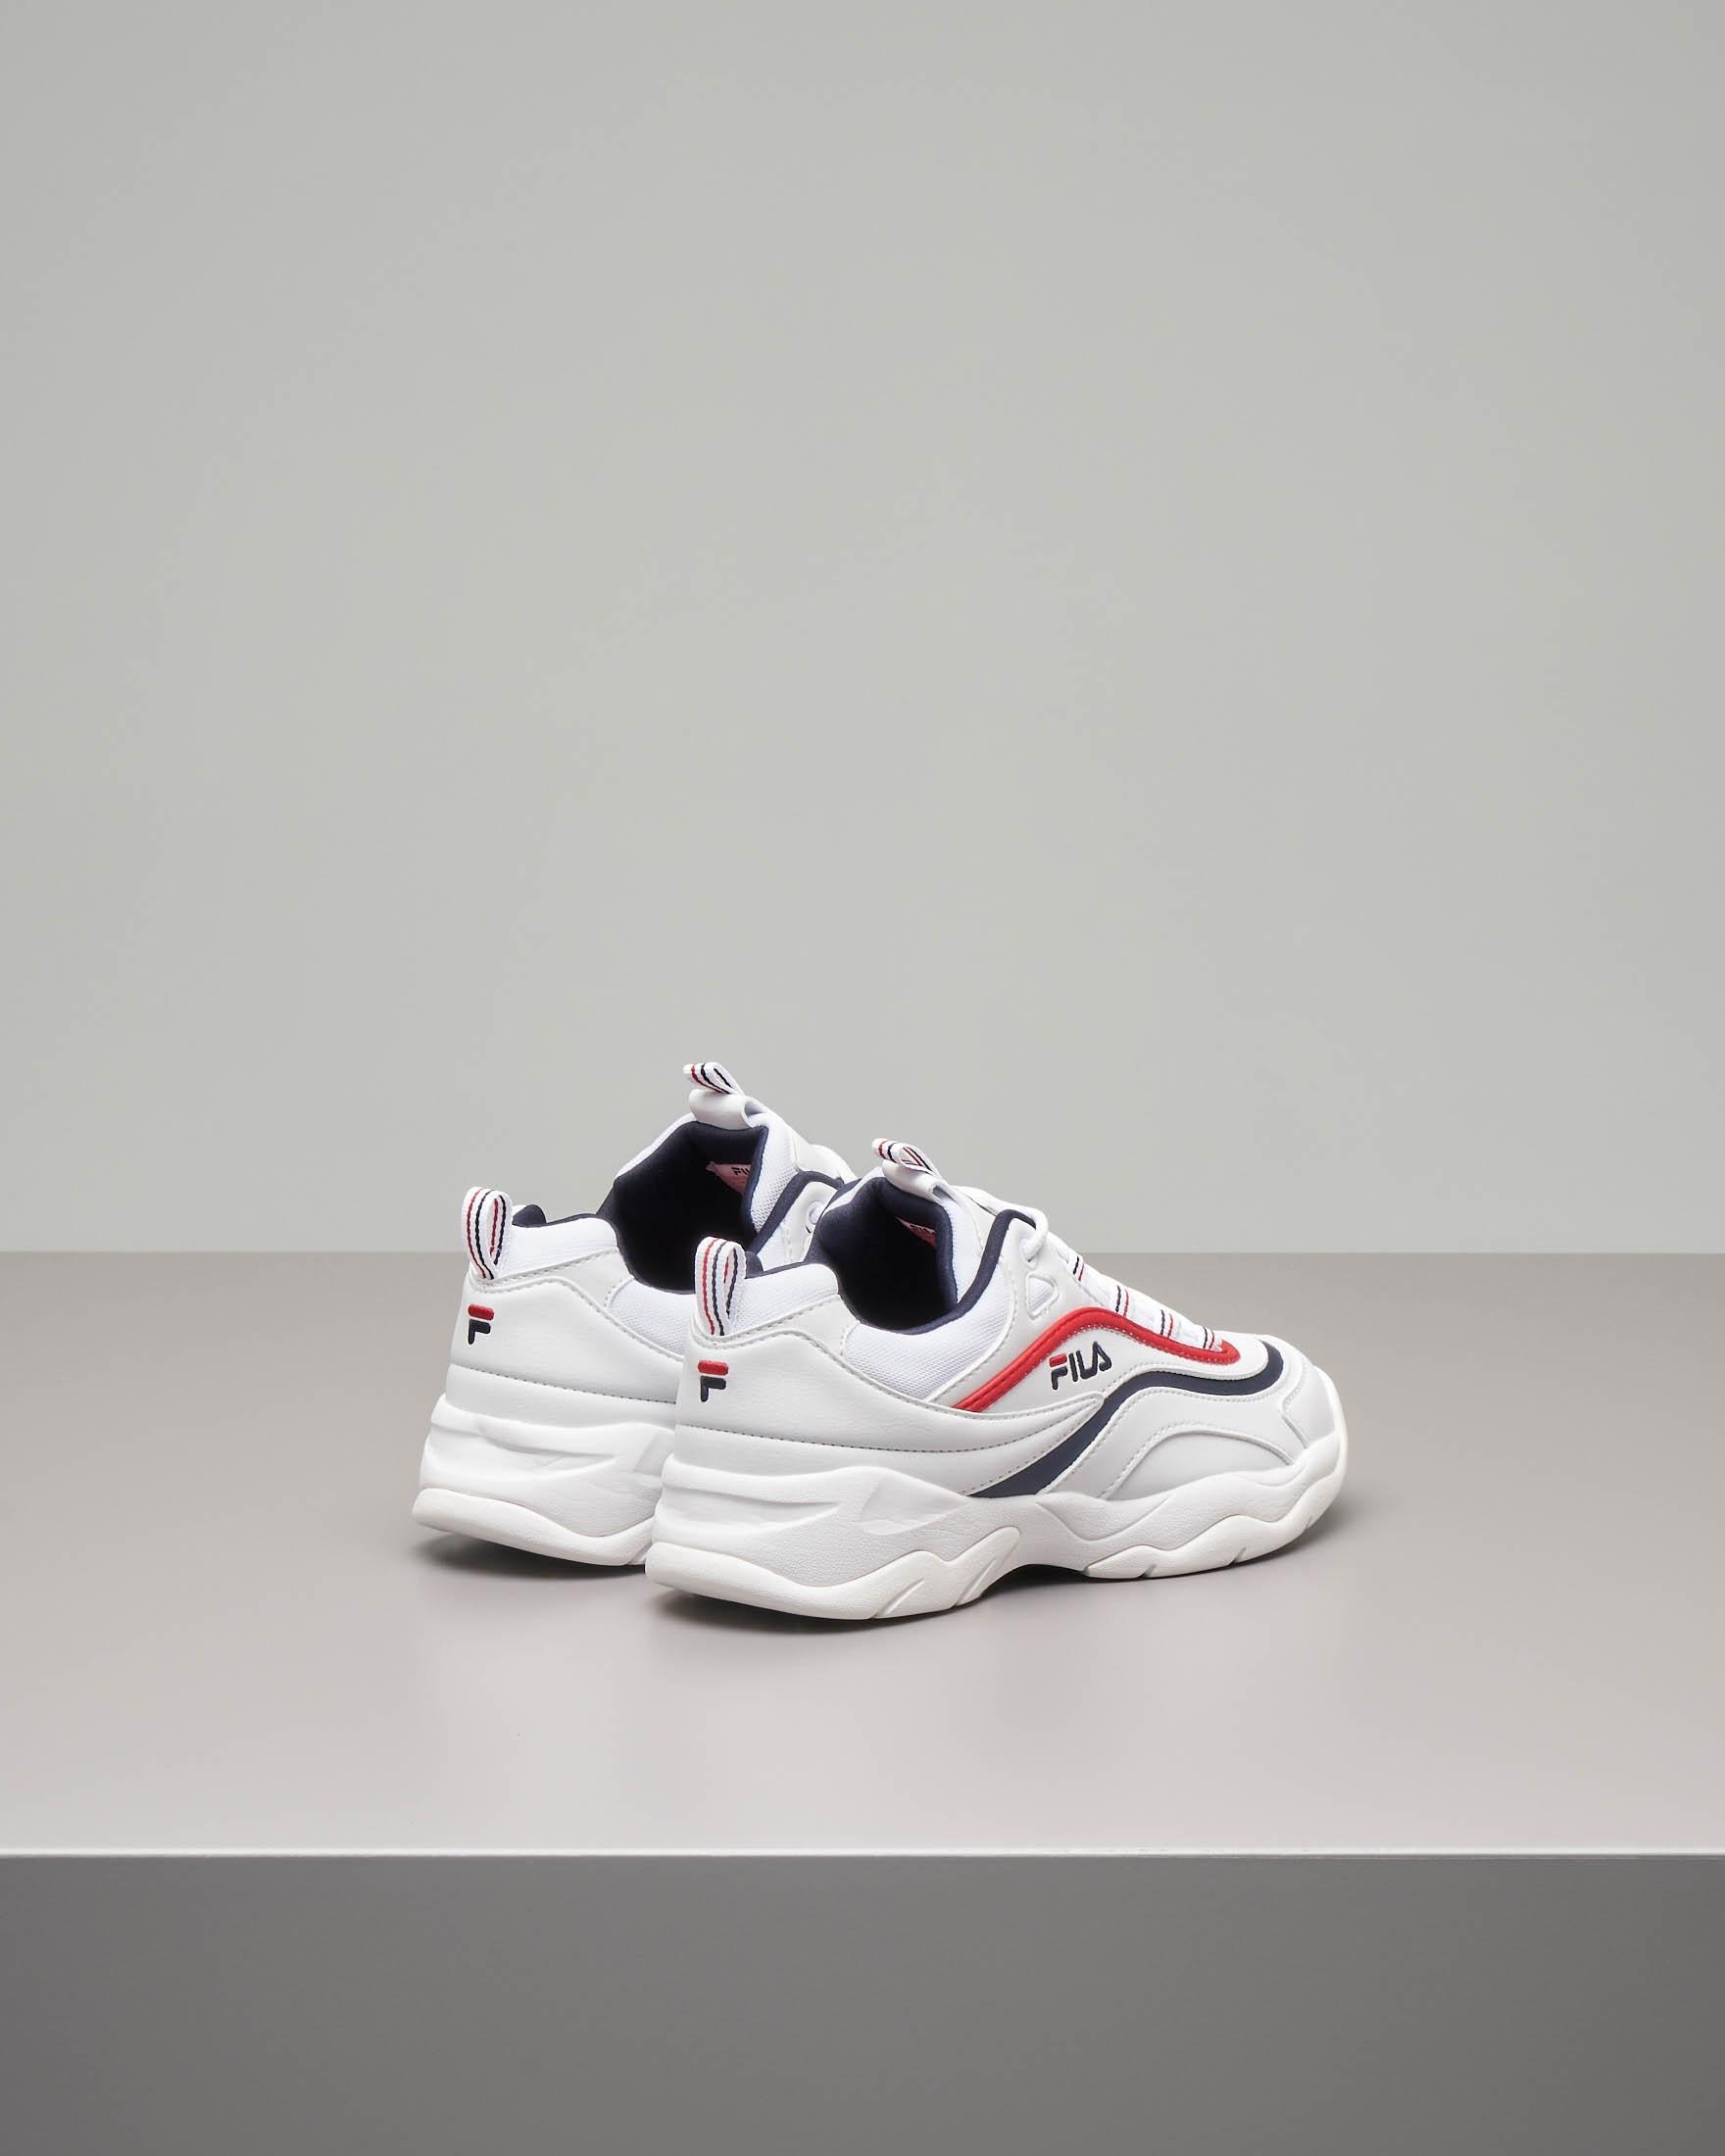 Sneaker Fila Ray low bianche con rifiniture rosse e blu